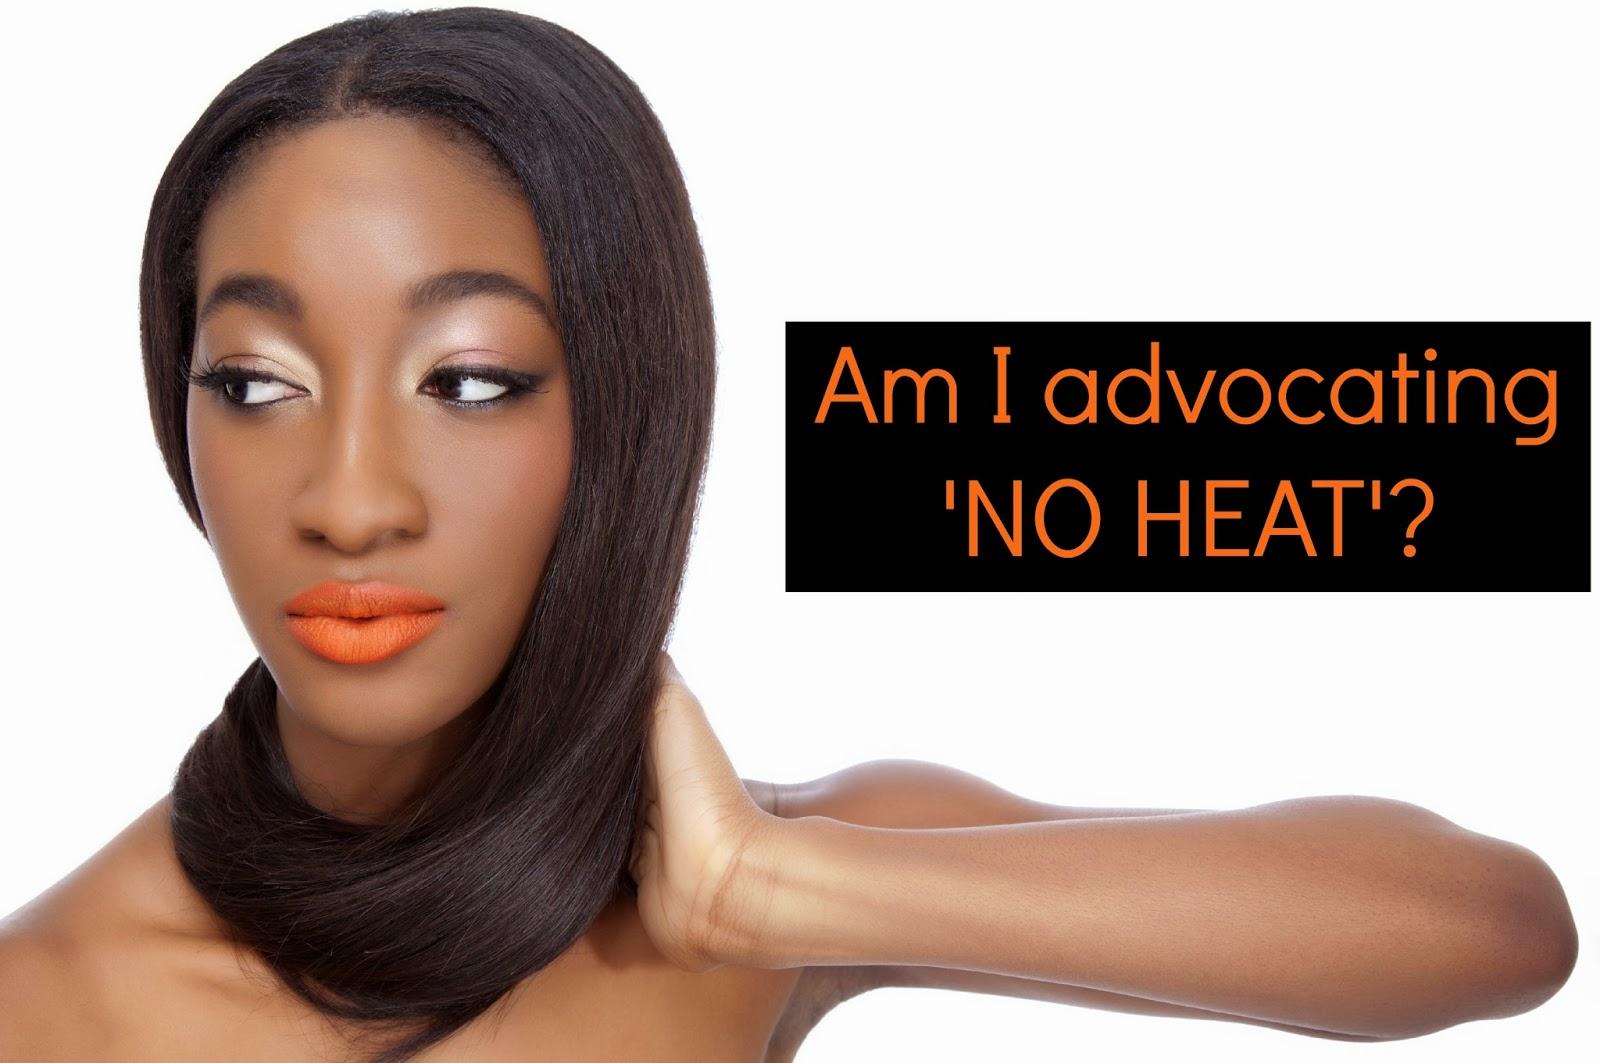 Am I advocating 'NO HEAT'?